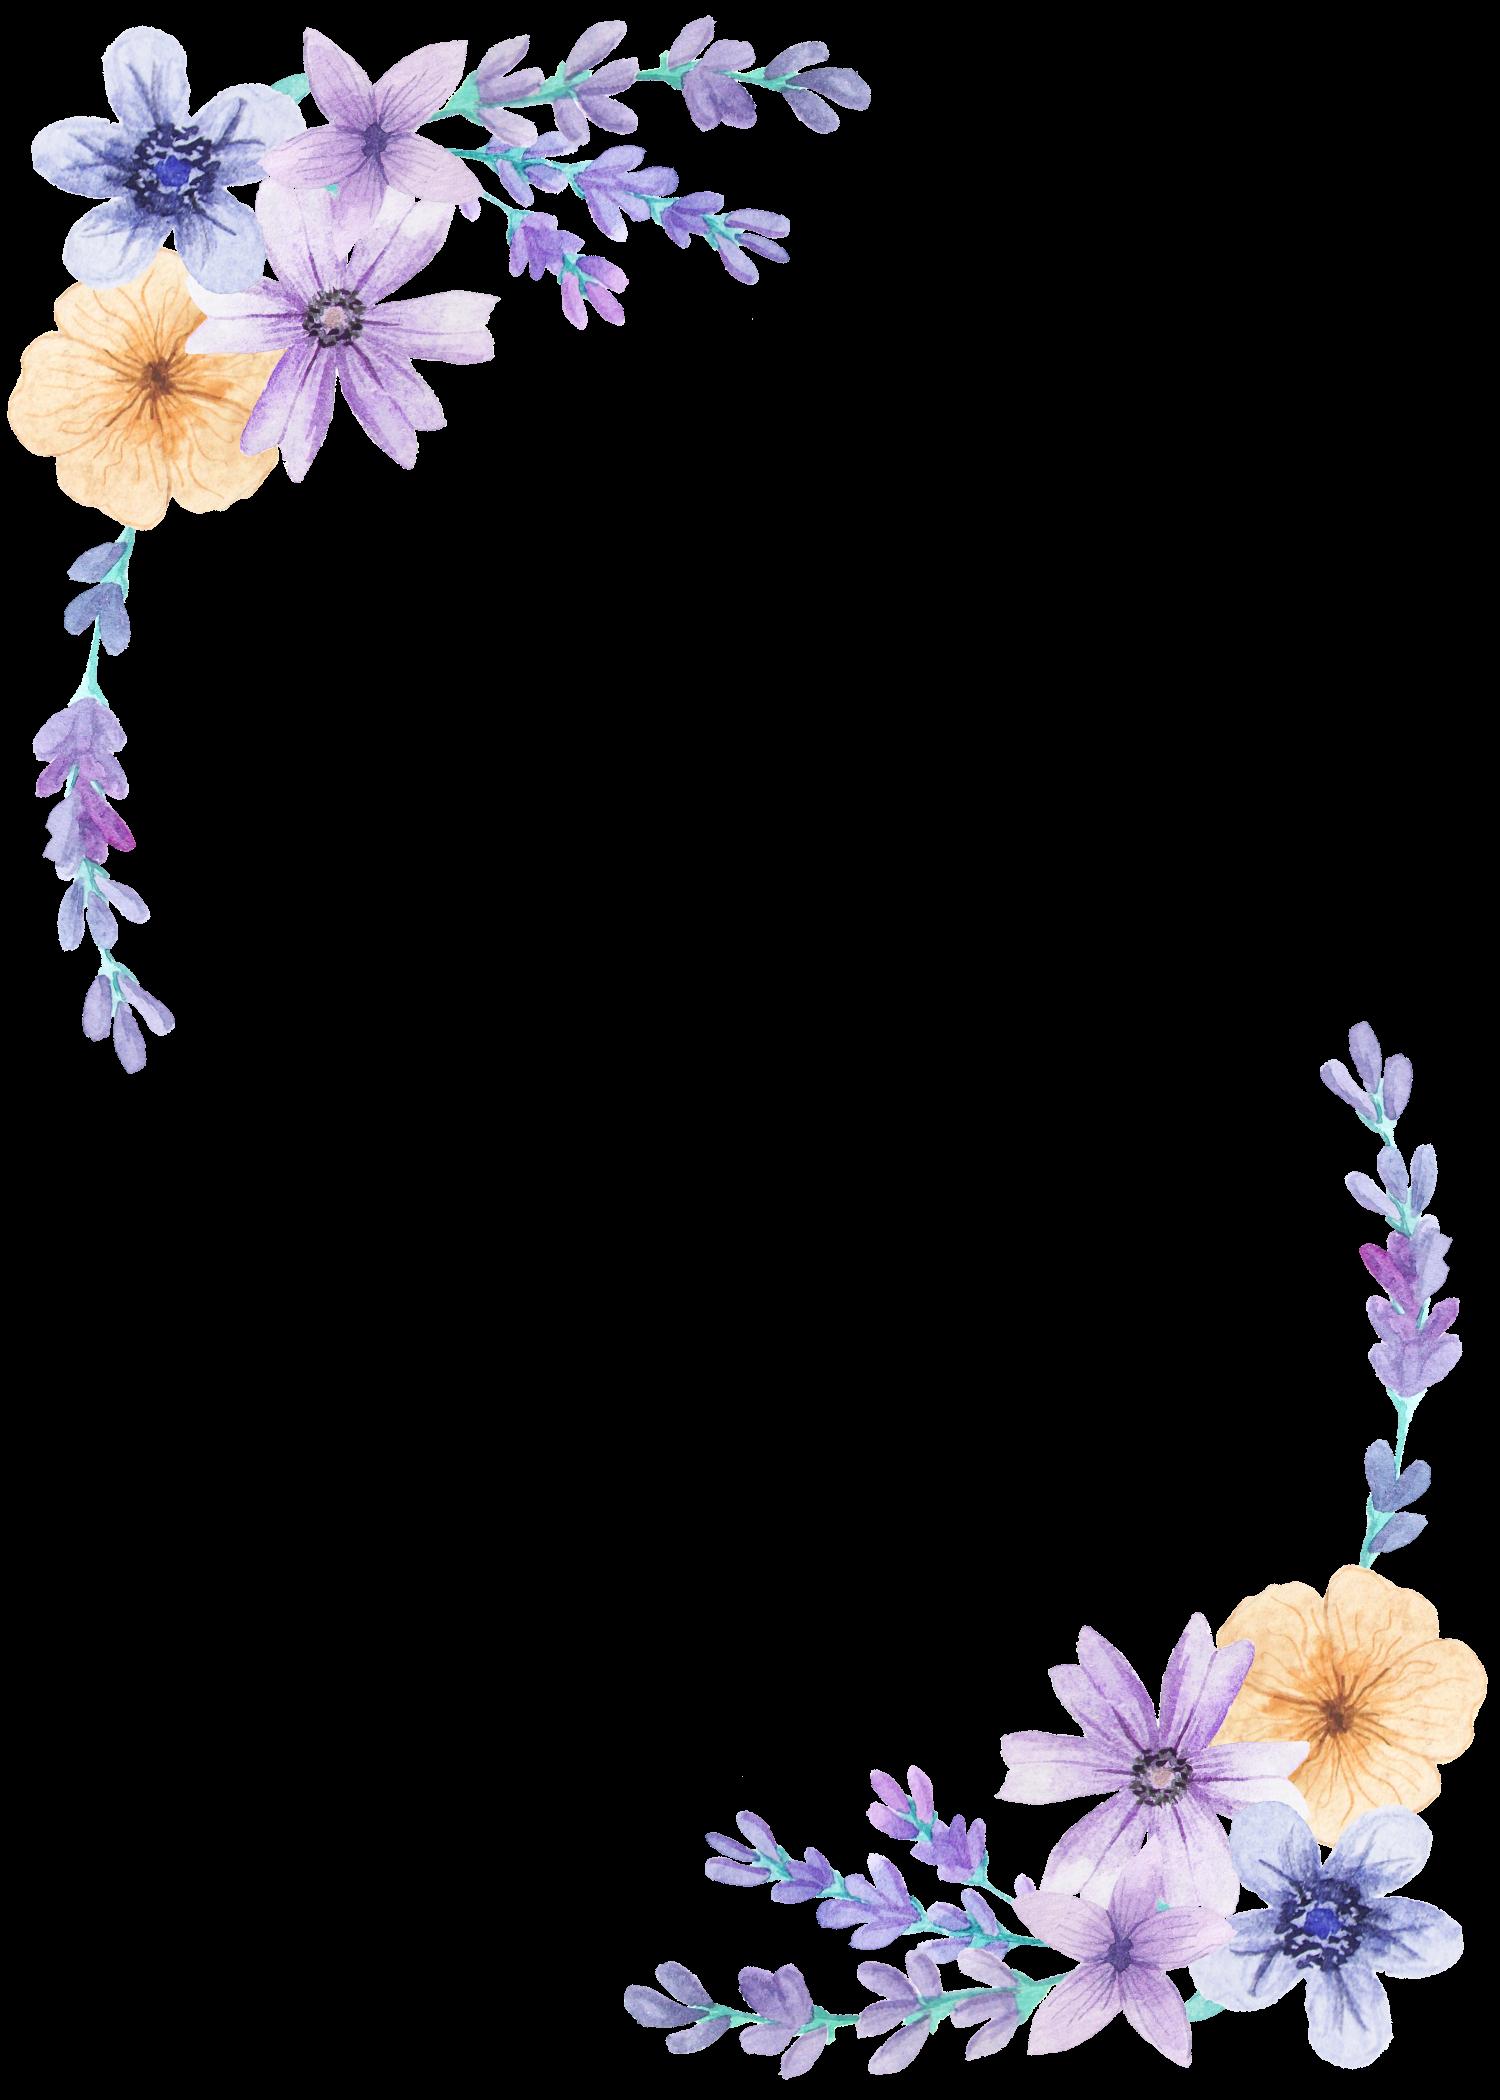 E33127722e623febc935ca3307592b06 Png 1 500 2 100 Bildepunkter Flower Png Images Flower Background Wallpaper Floral Watercolor